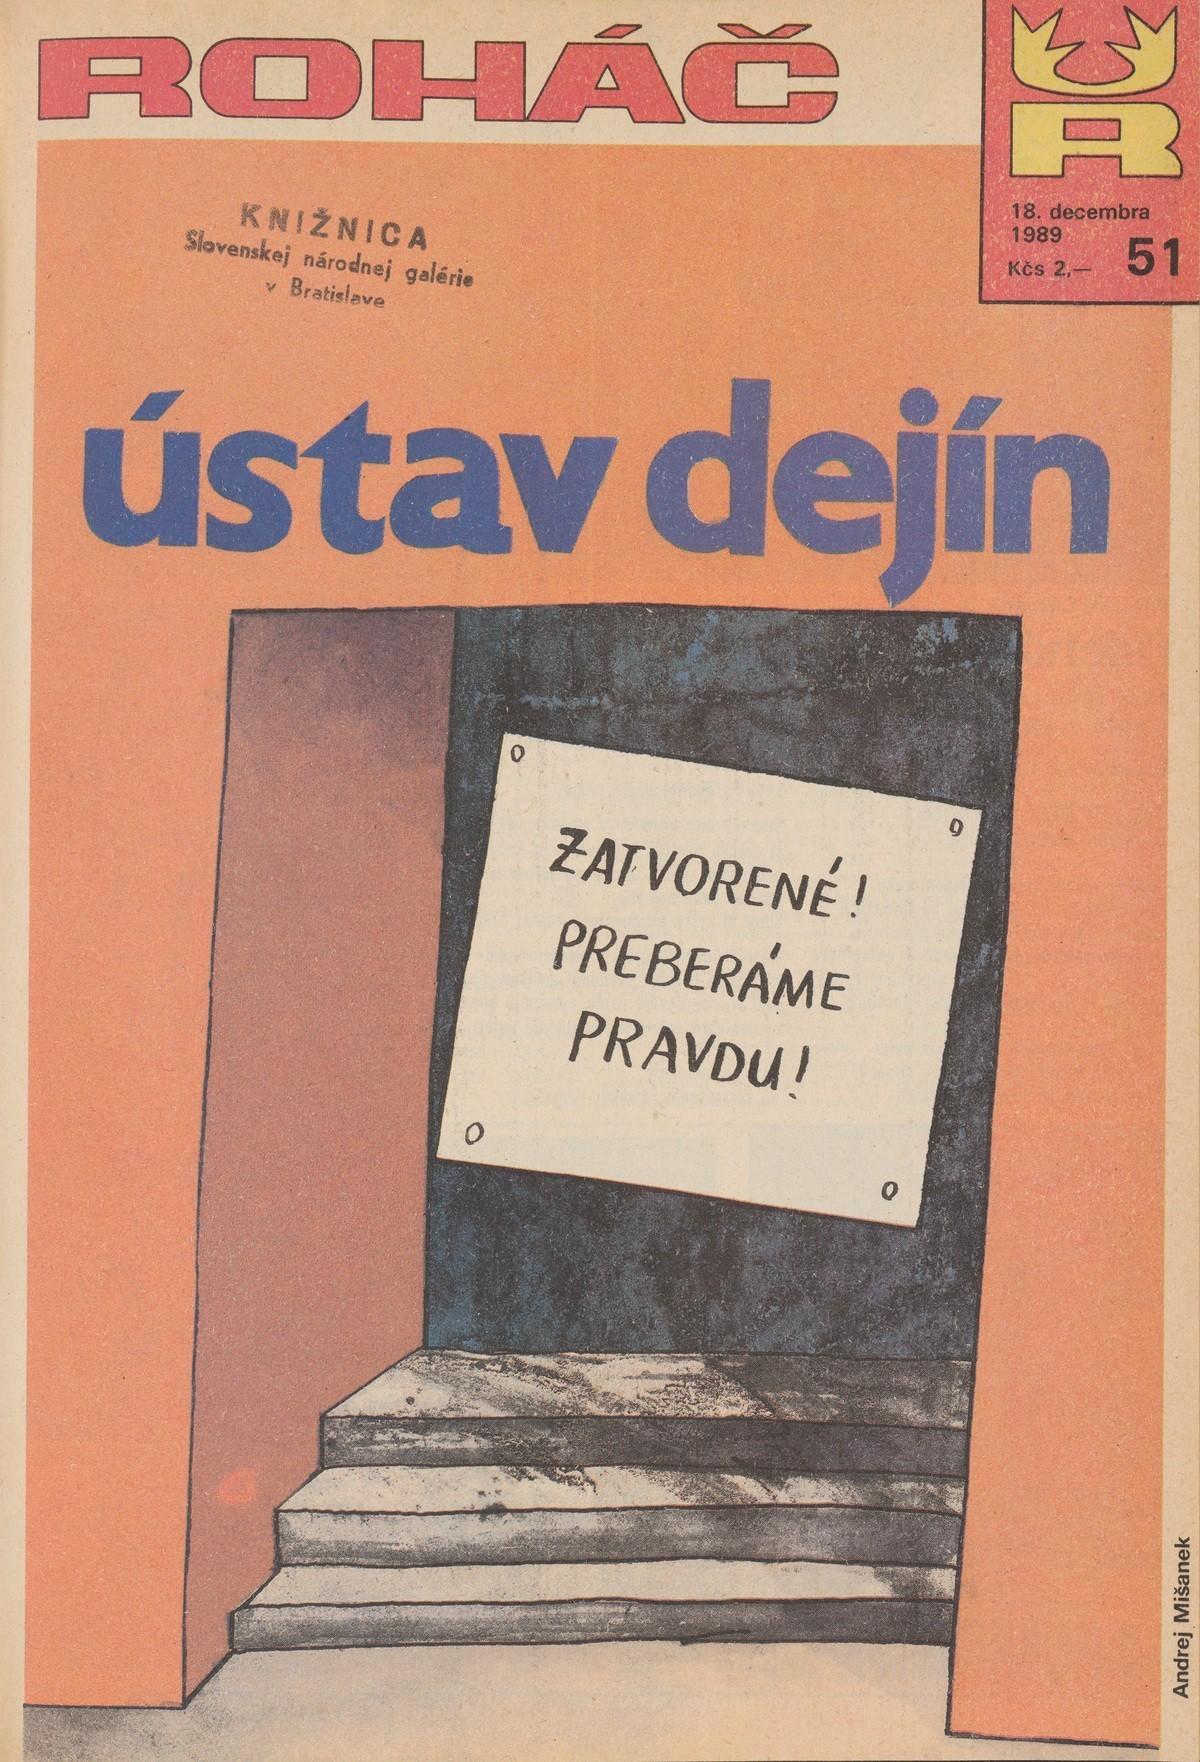 Andrej Mišanek, Ústav dejín. 1989. Časopis Roháč